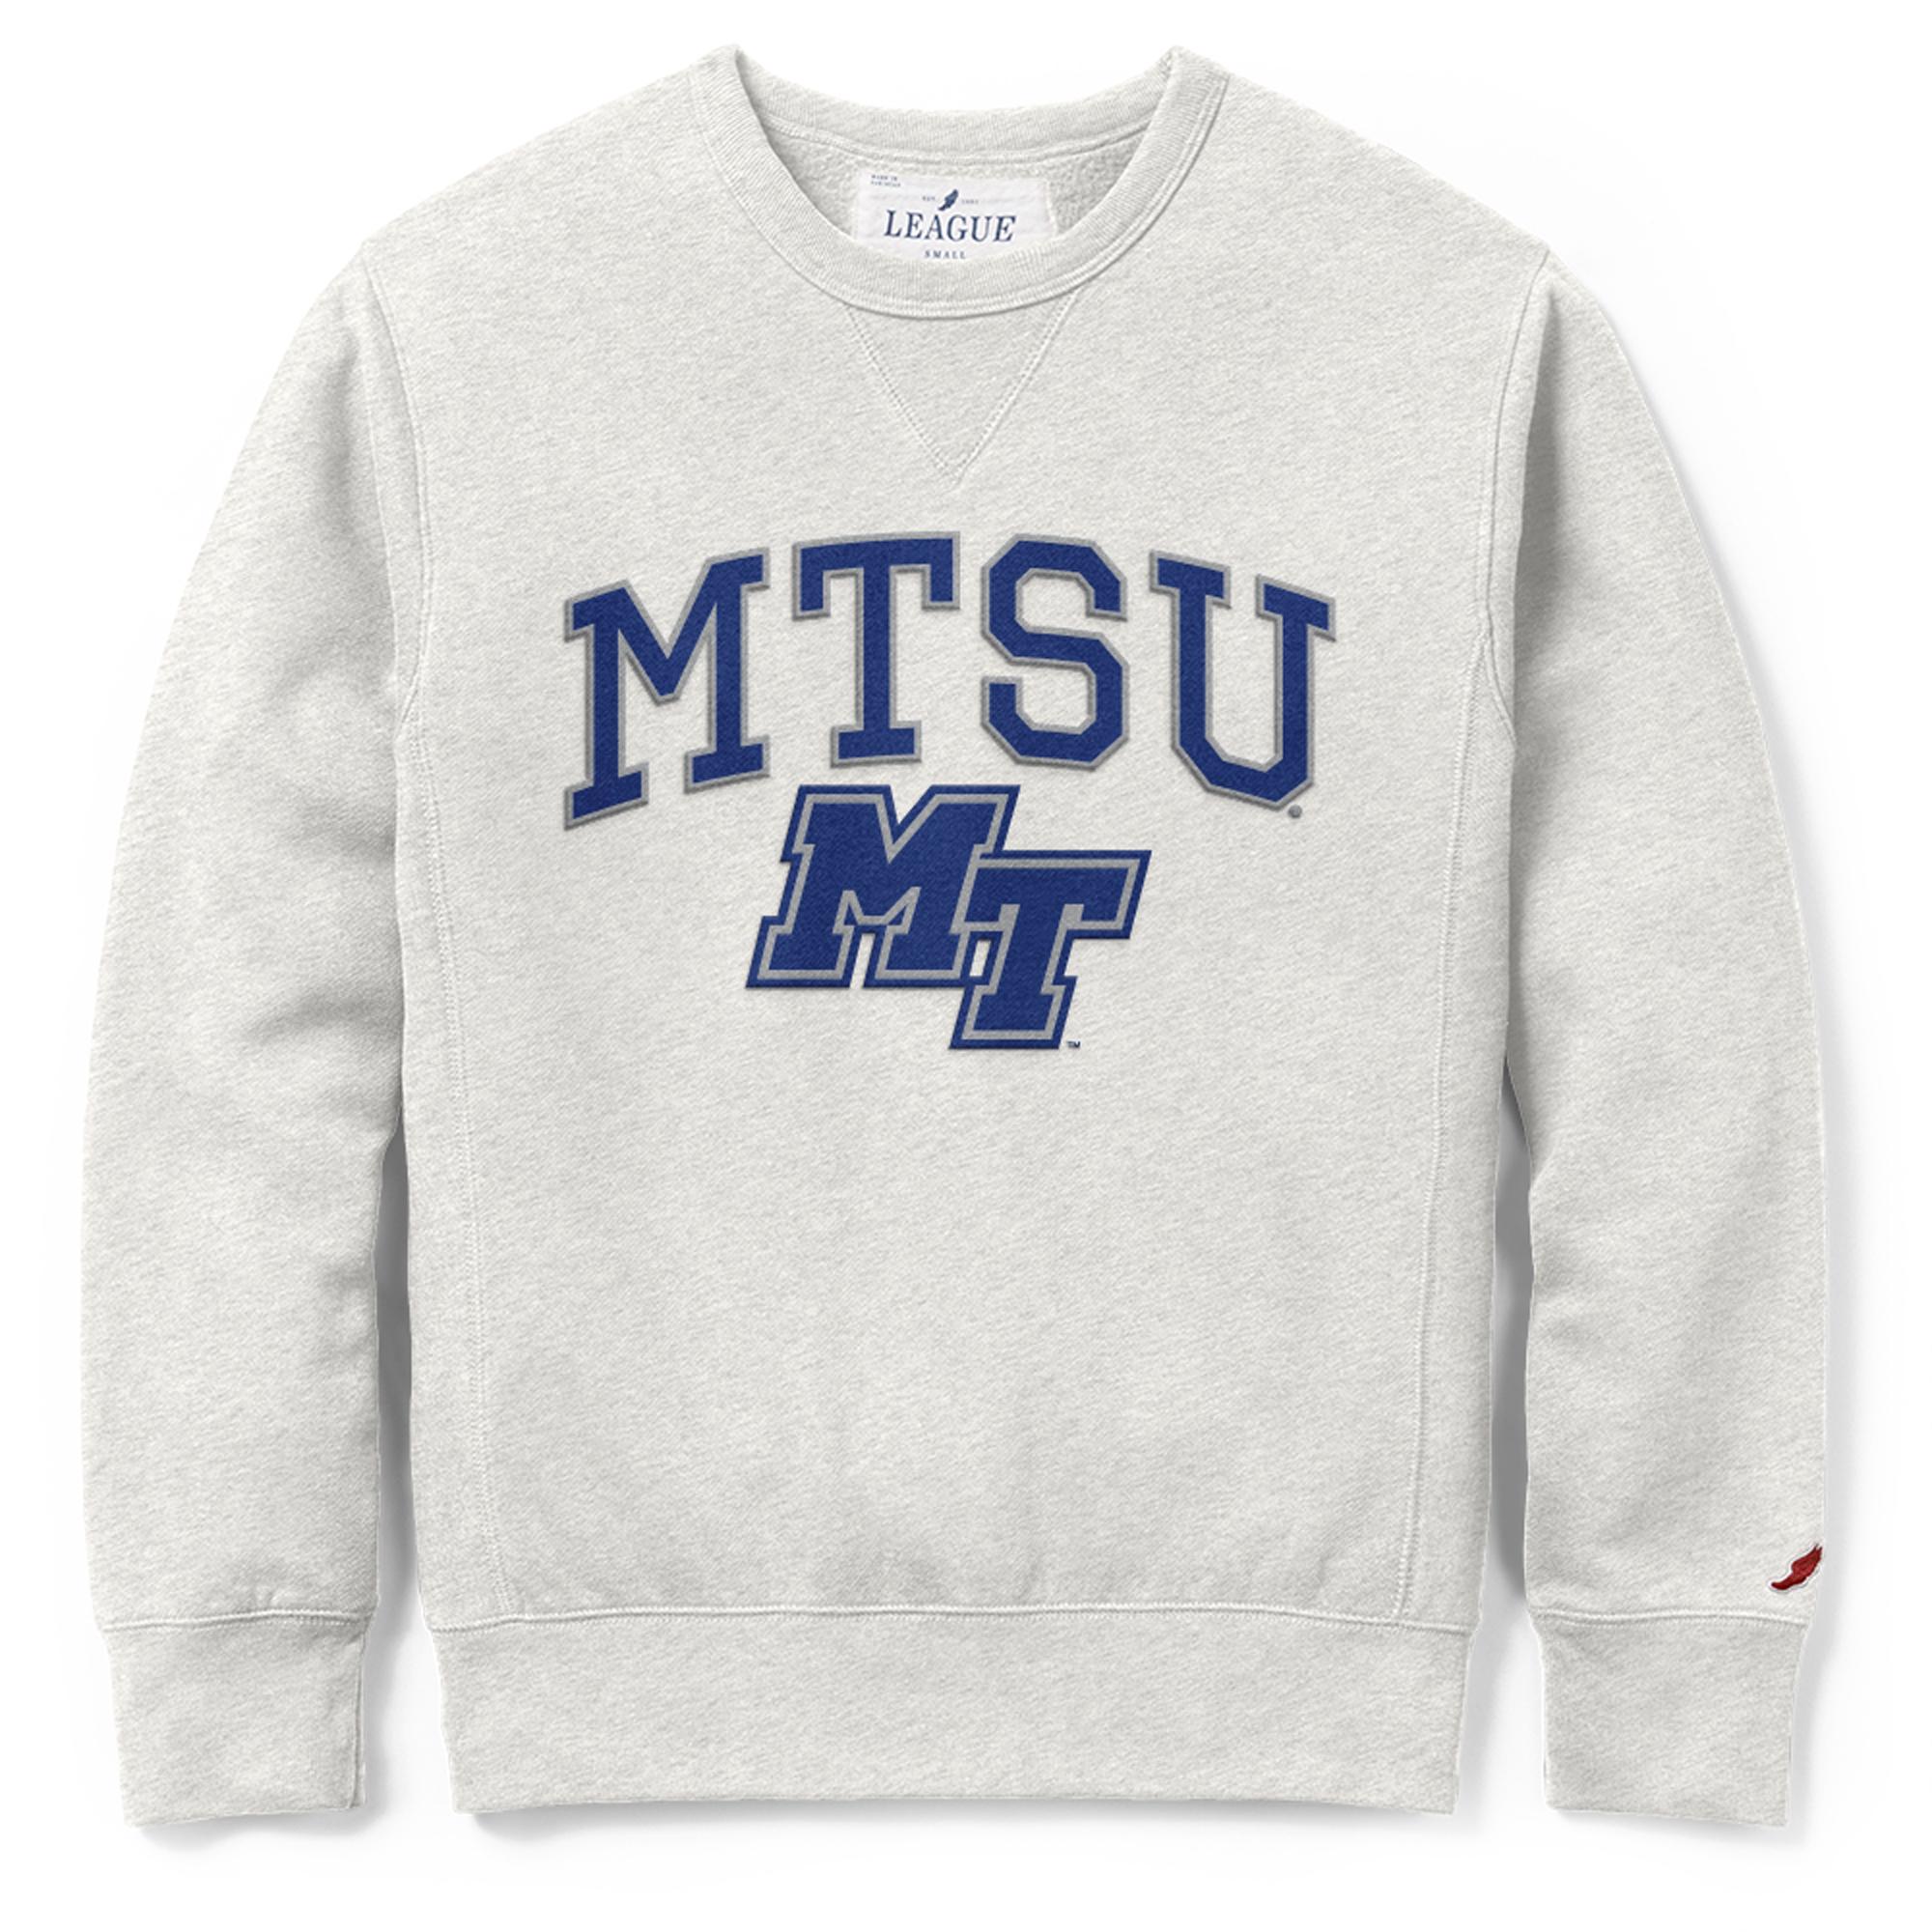 MTSU MT Logo Stadium Crewneck Sweatshirt